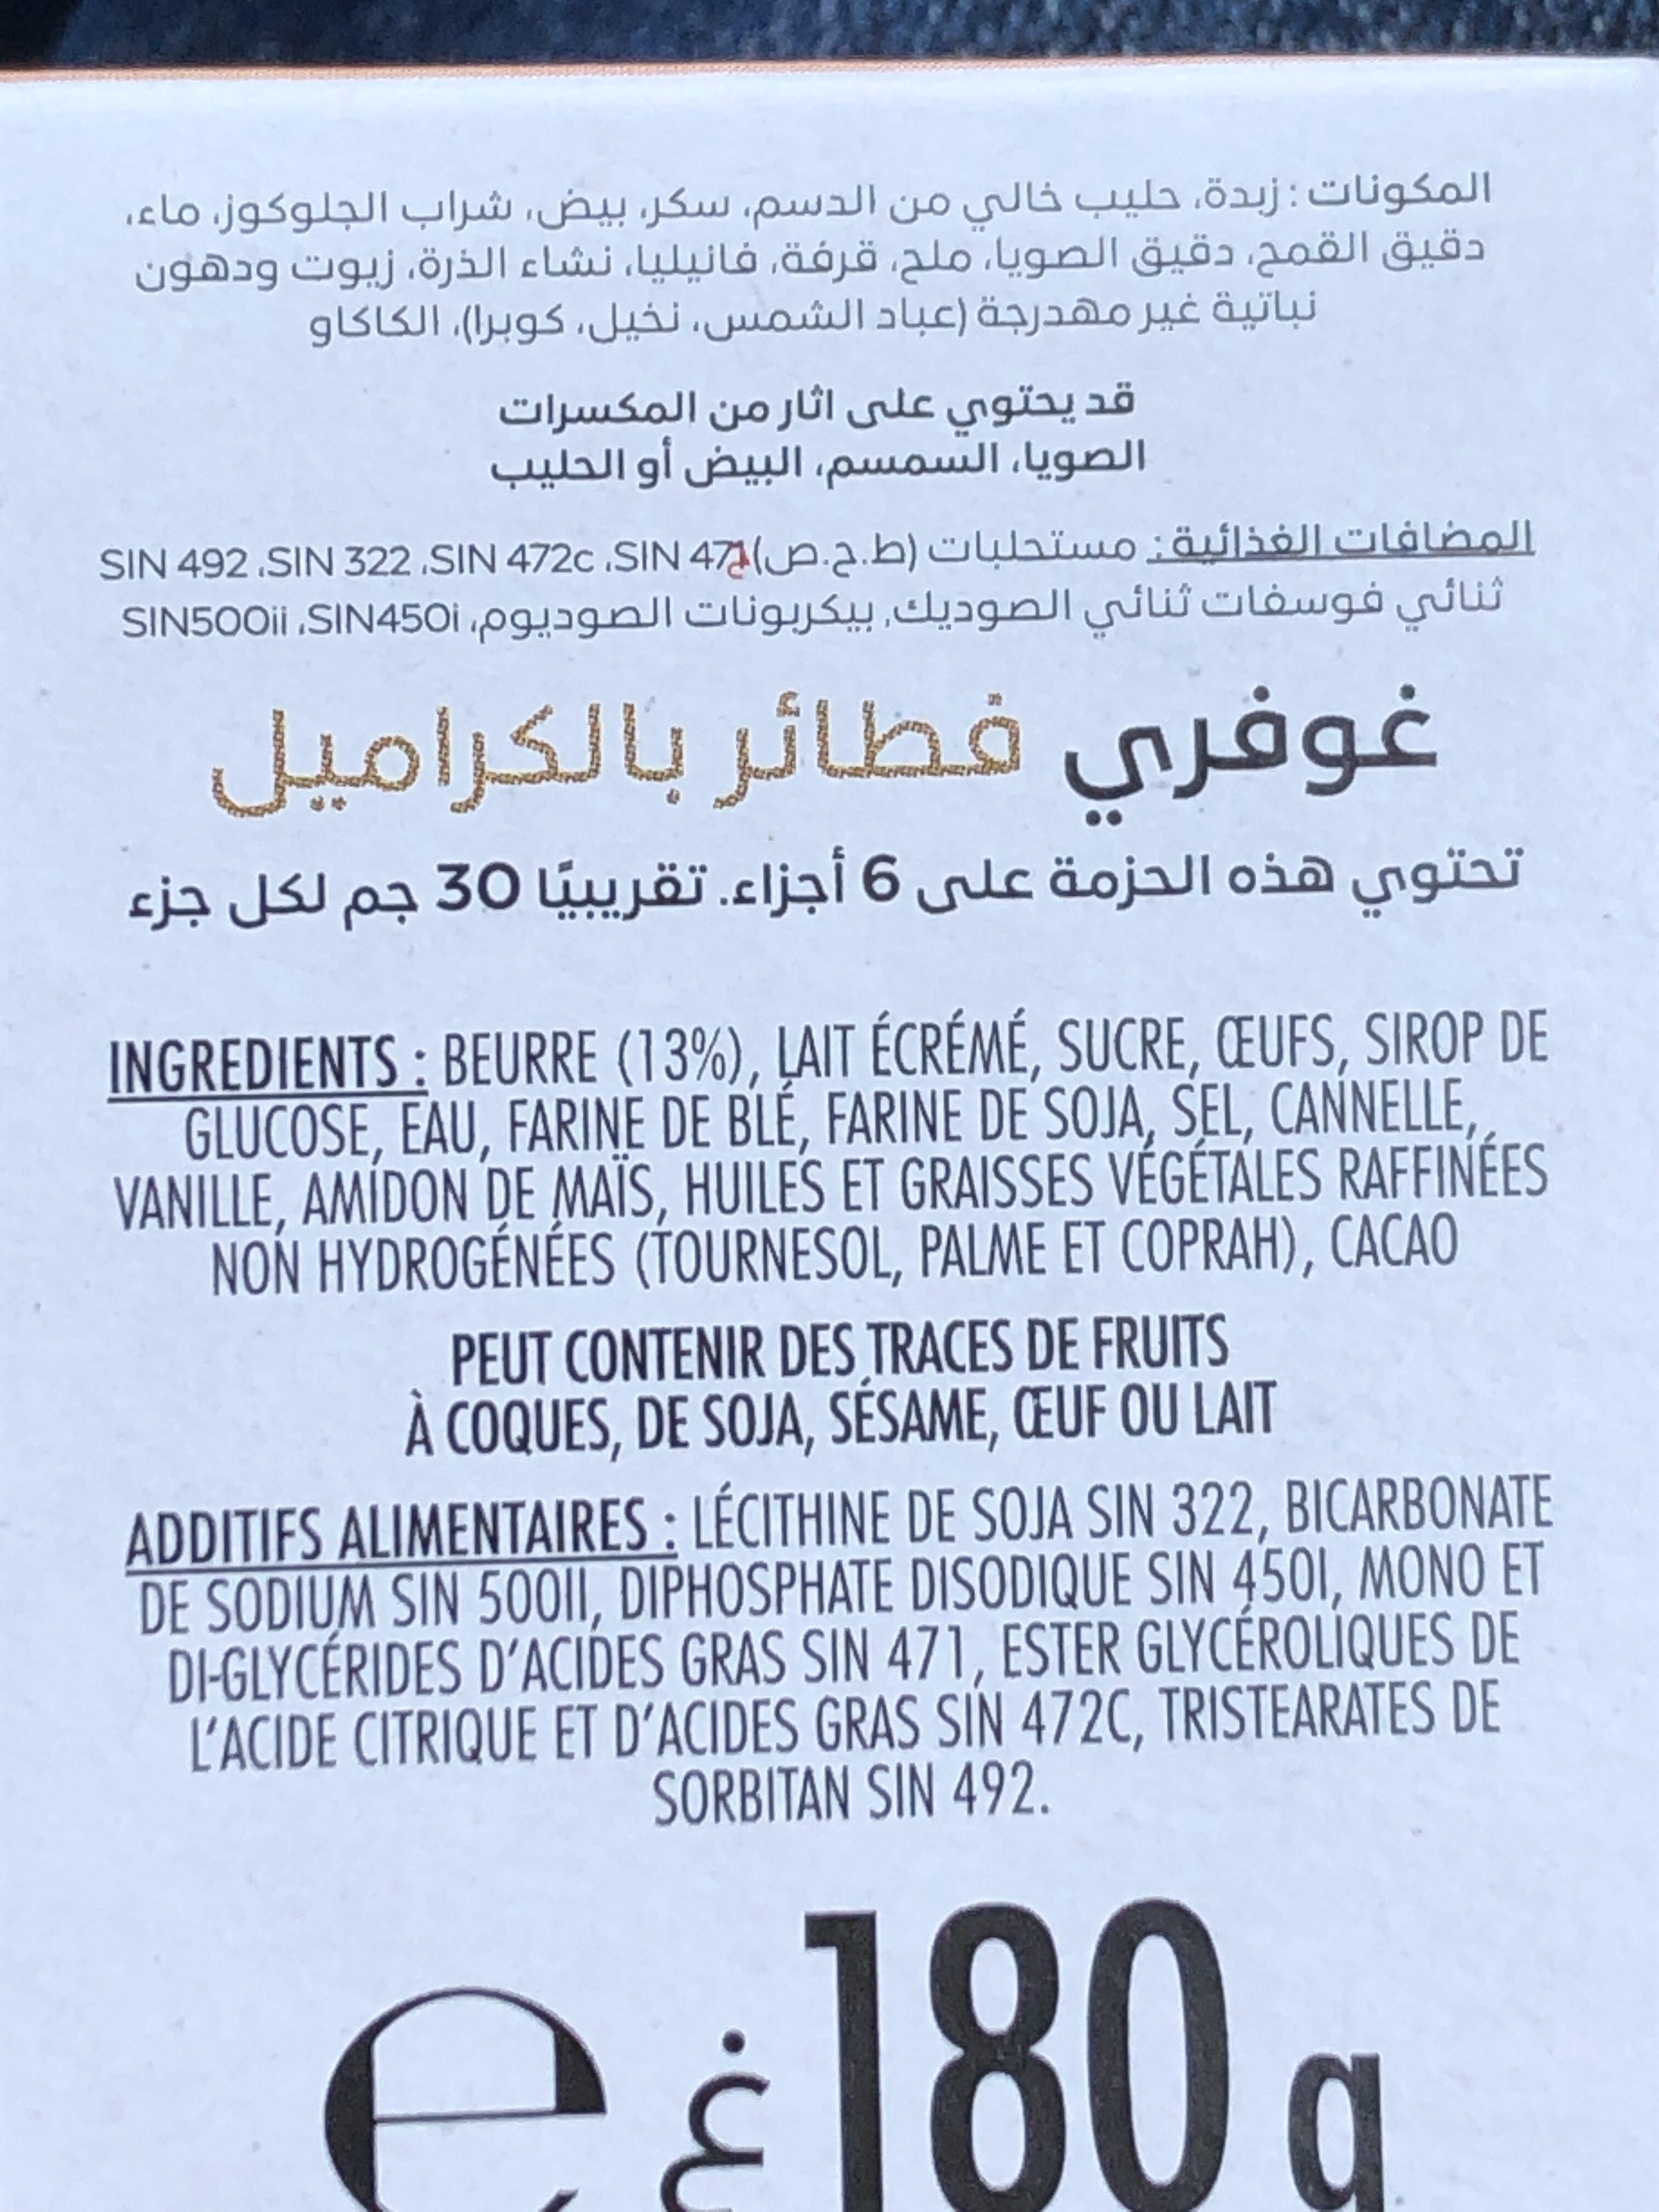 Gaufres cacao caramel - المكونات - fr